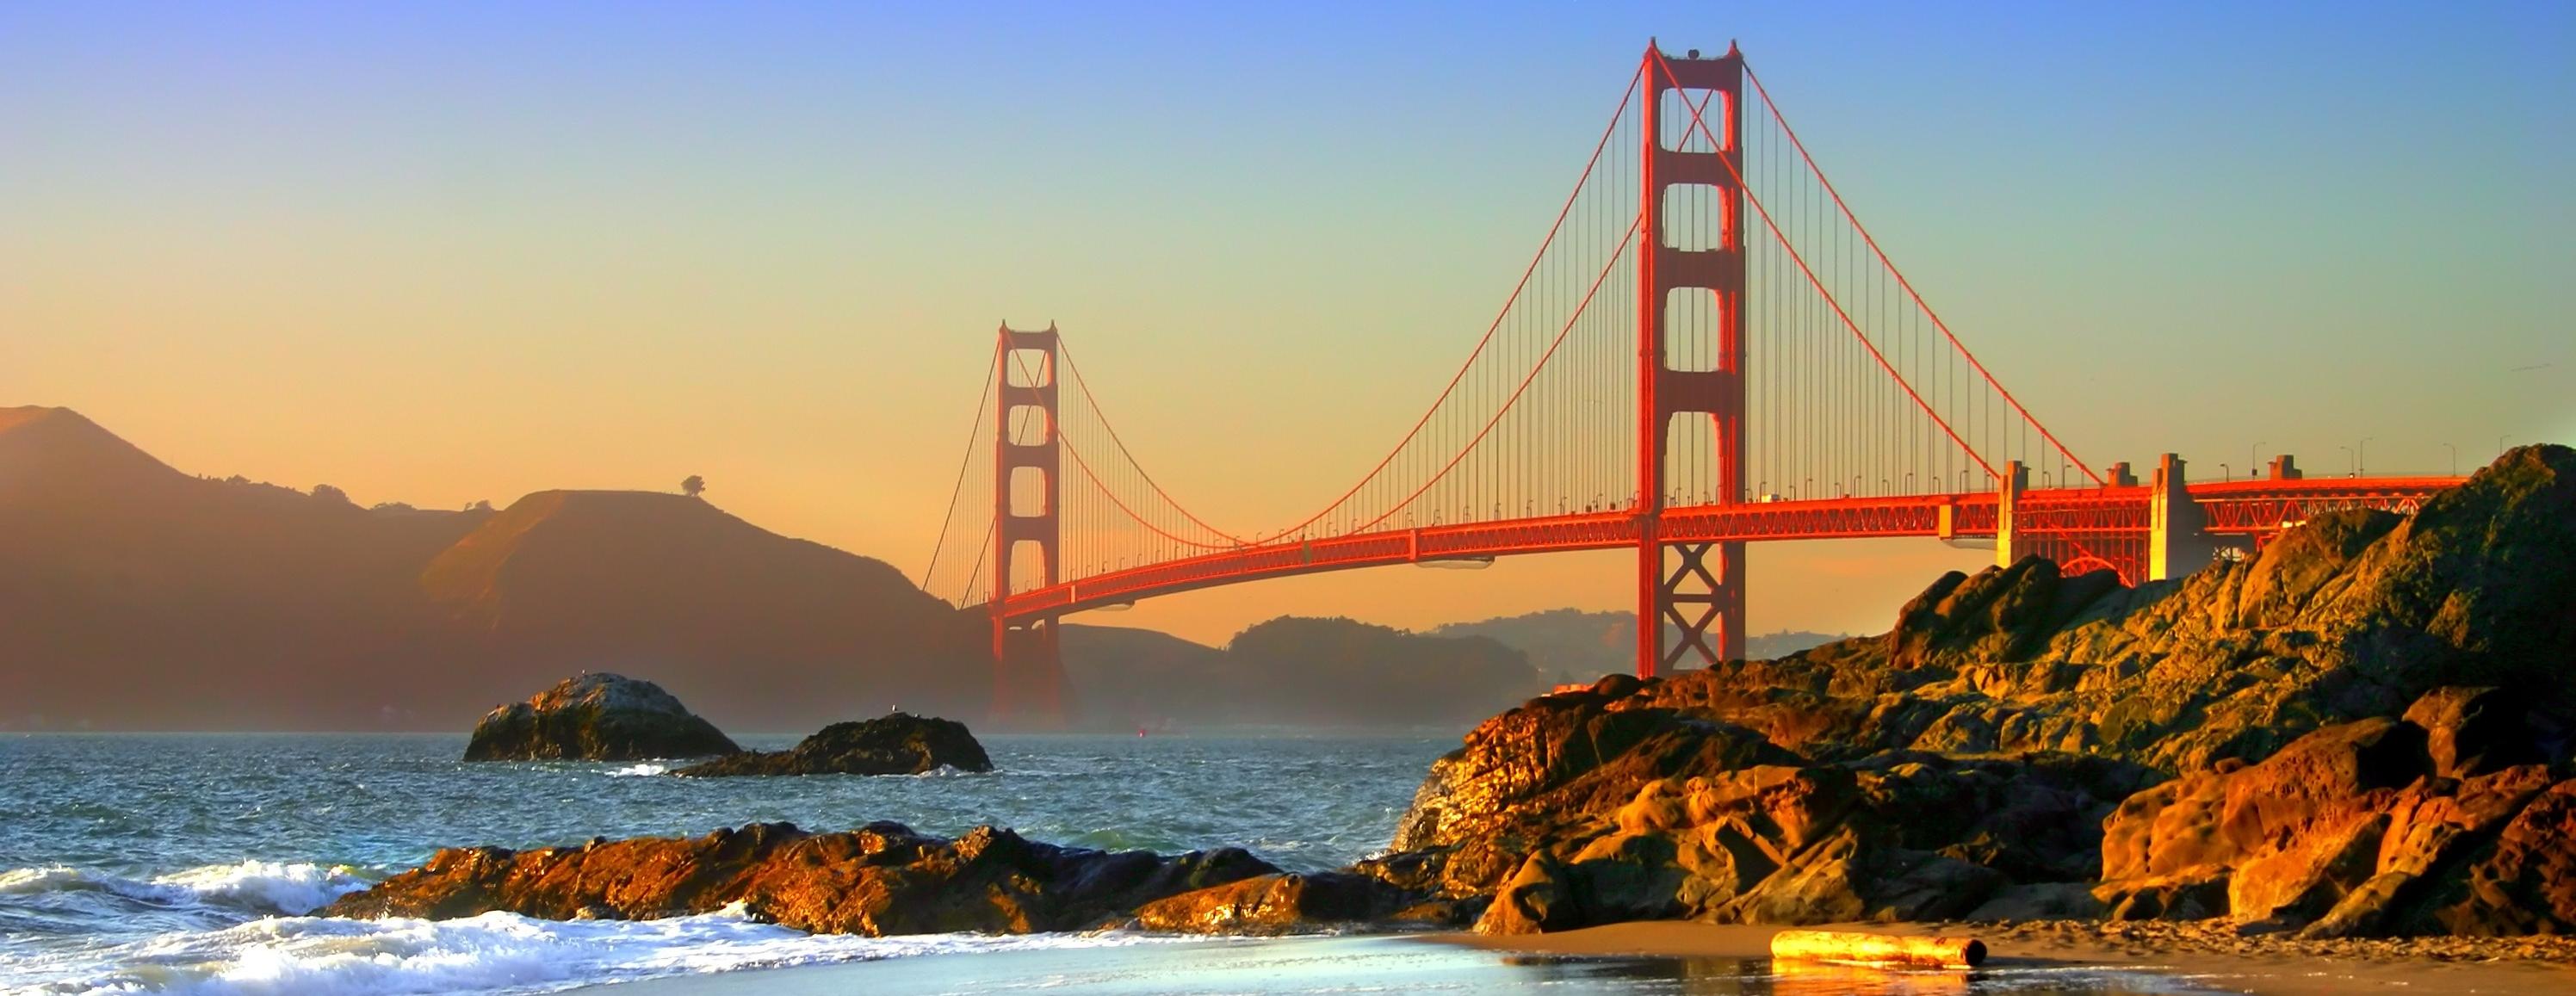 golden-gate-bridge-and-beach-cropped